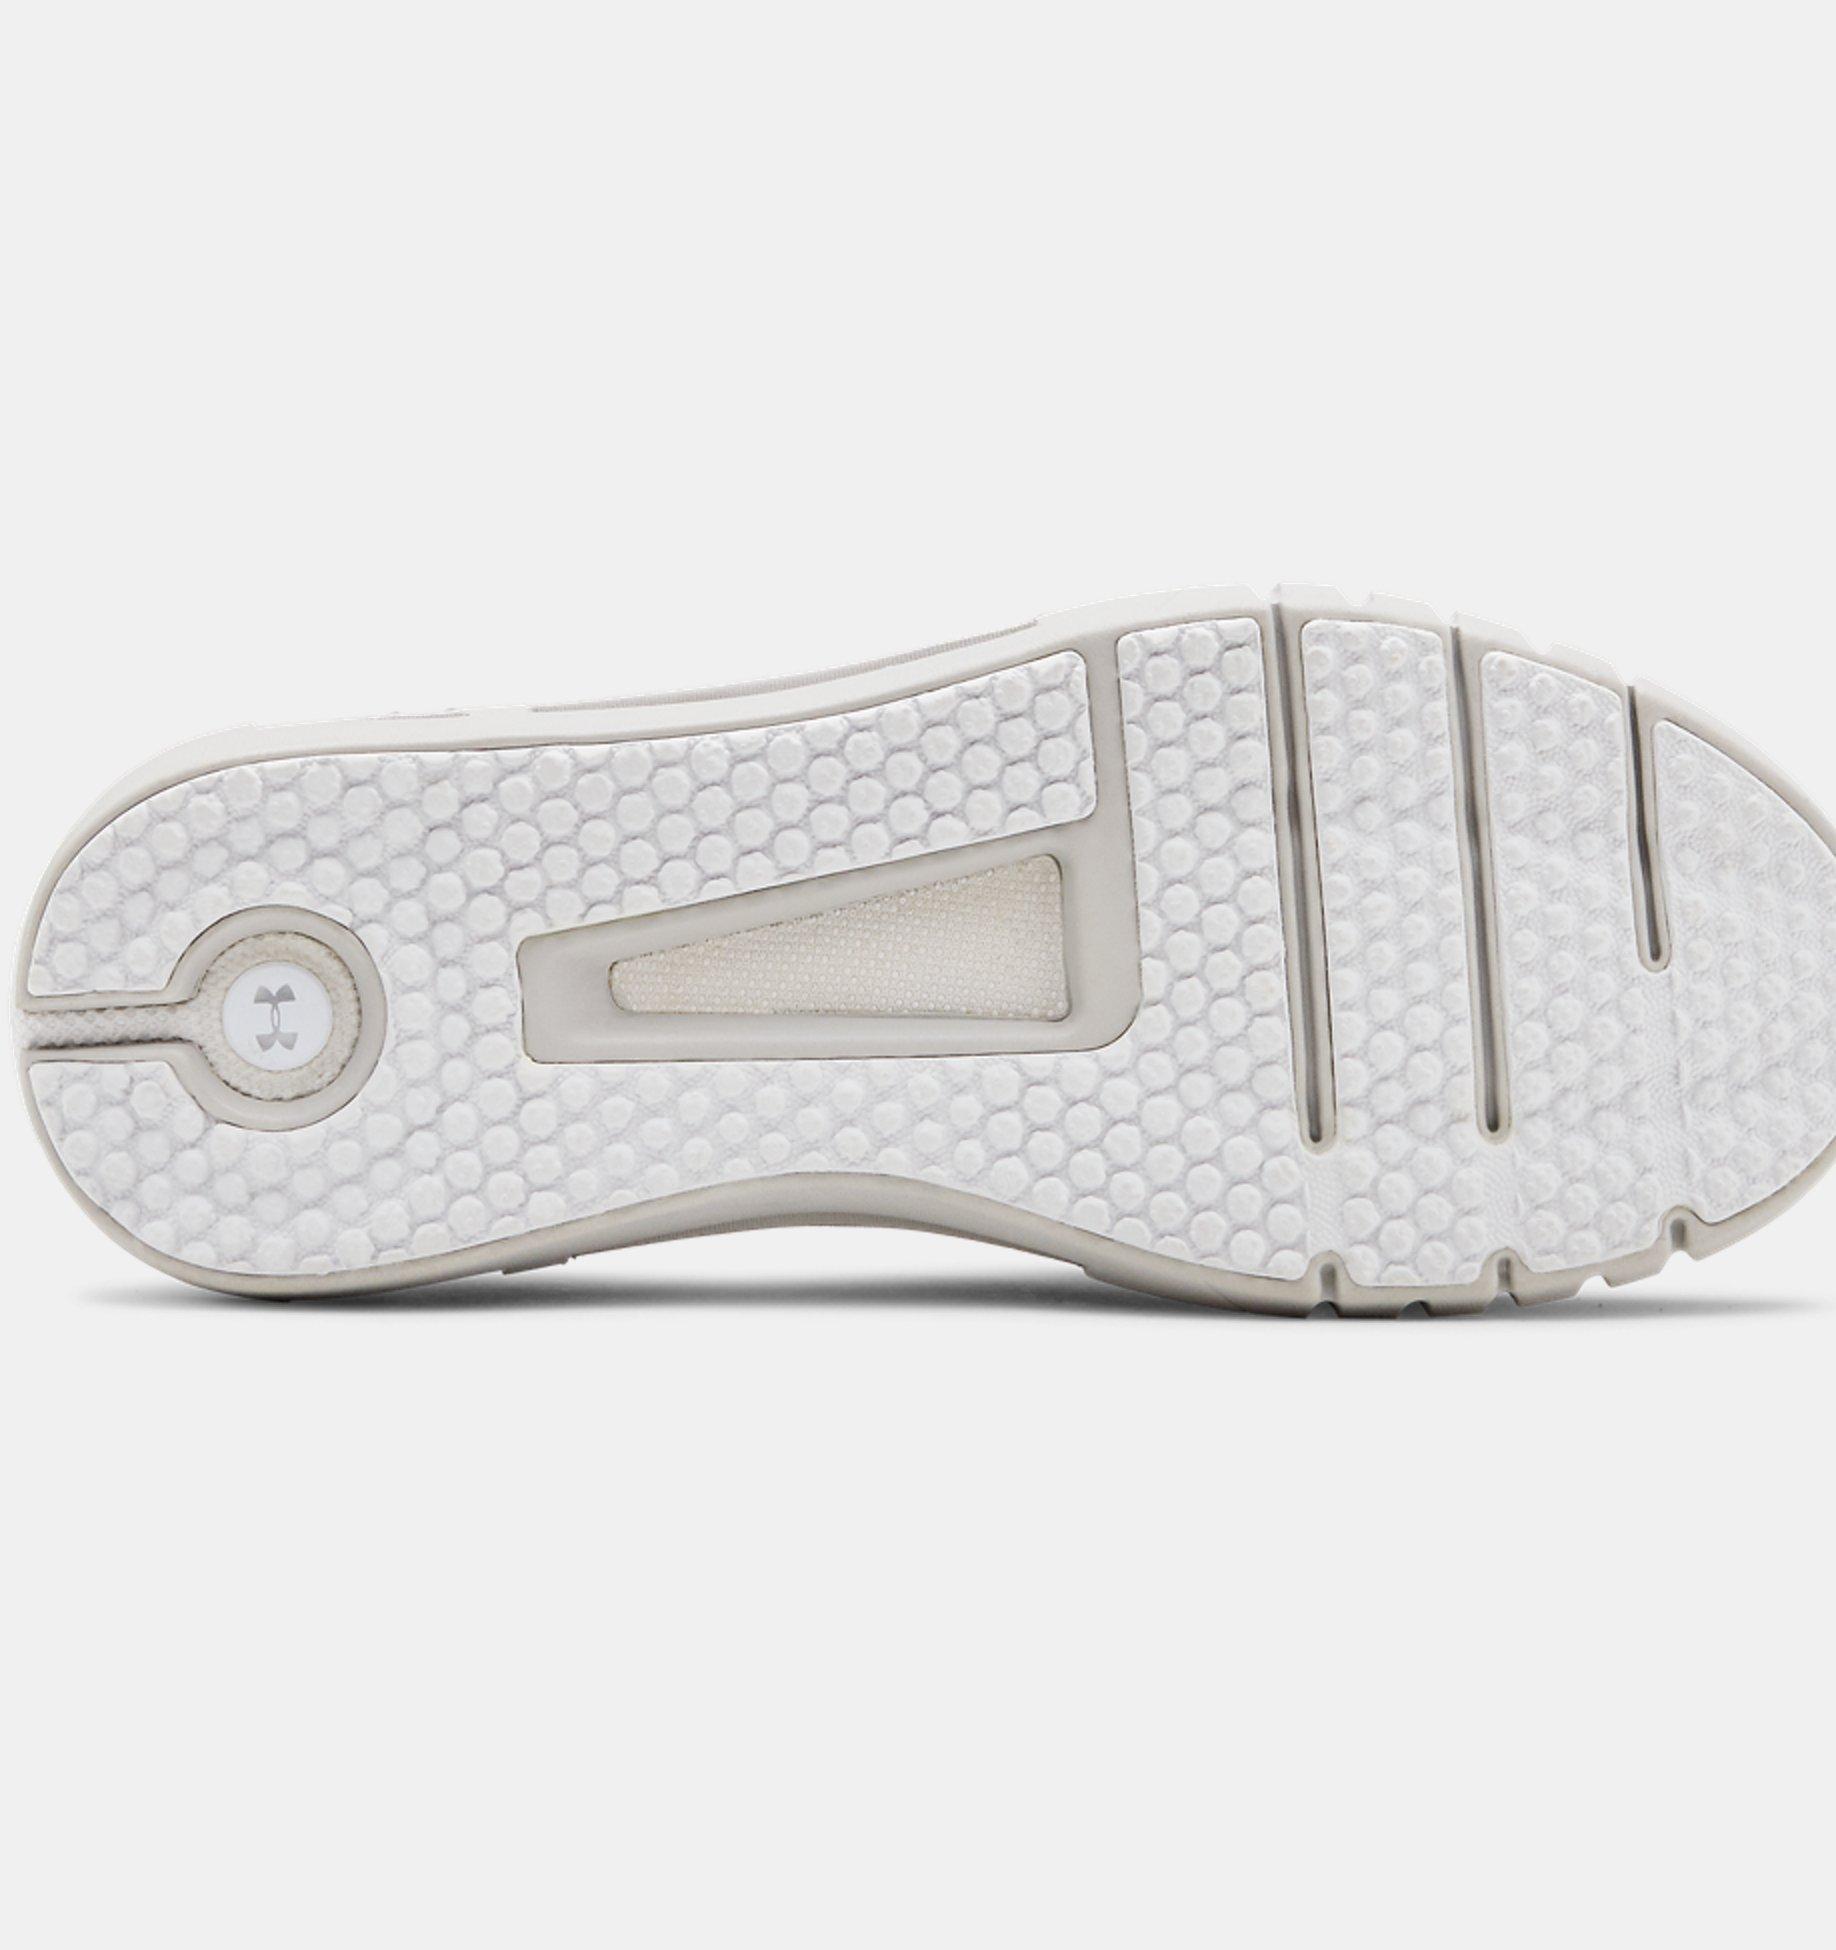 Ua Perf Hovr™ Suede Sportstyle FemmeUnder Chaussures Slk Pour Evo 1cFJlKT